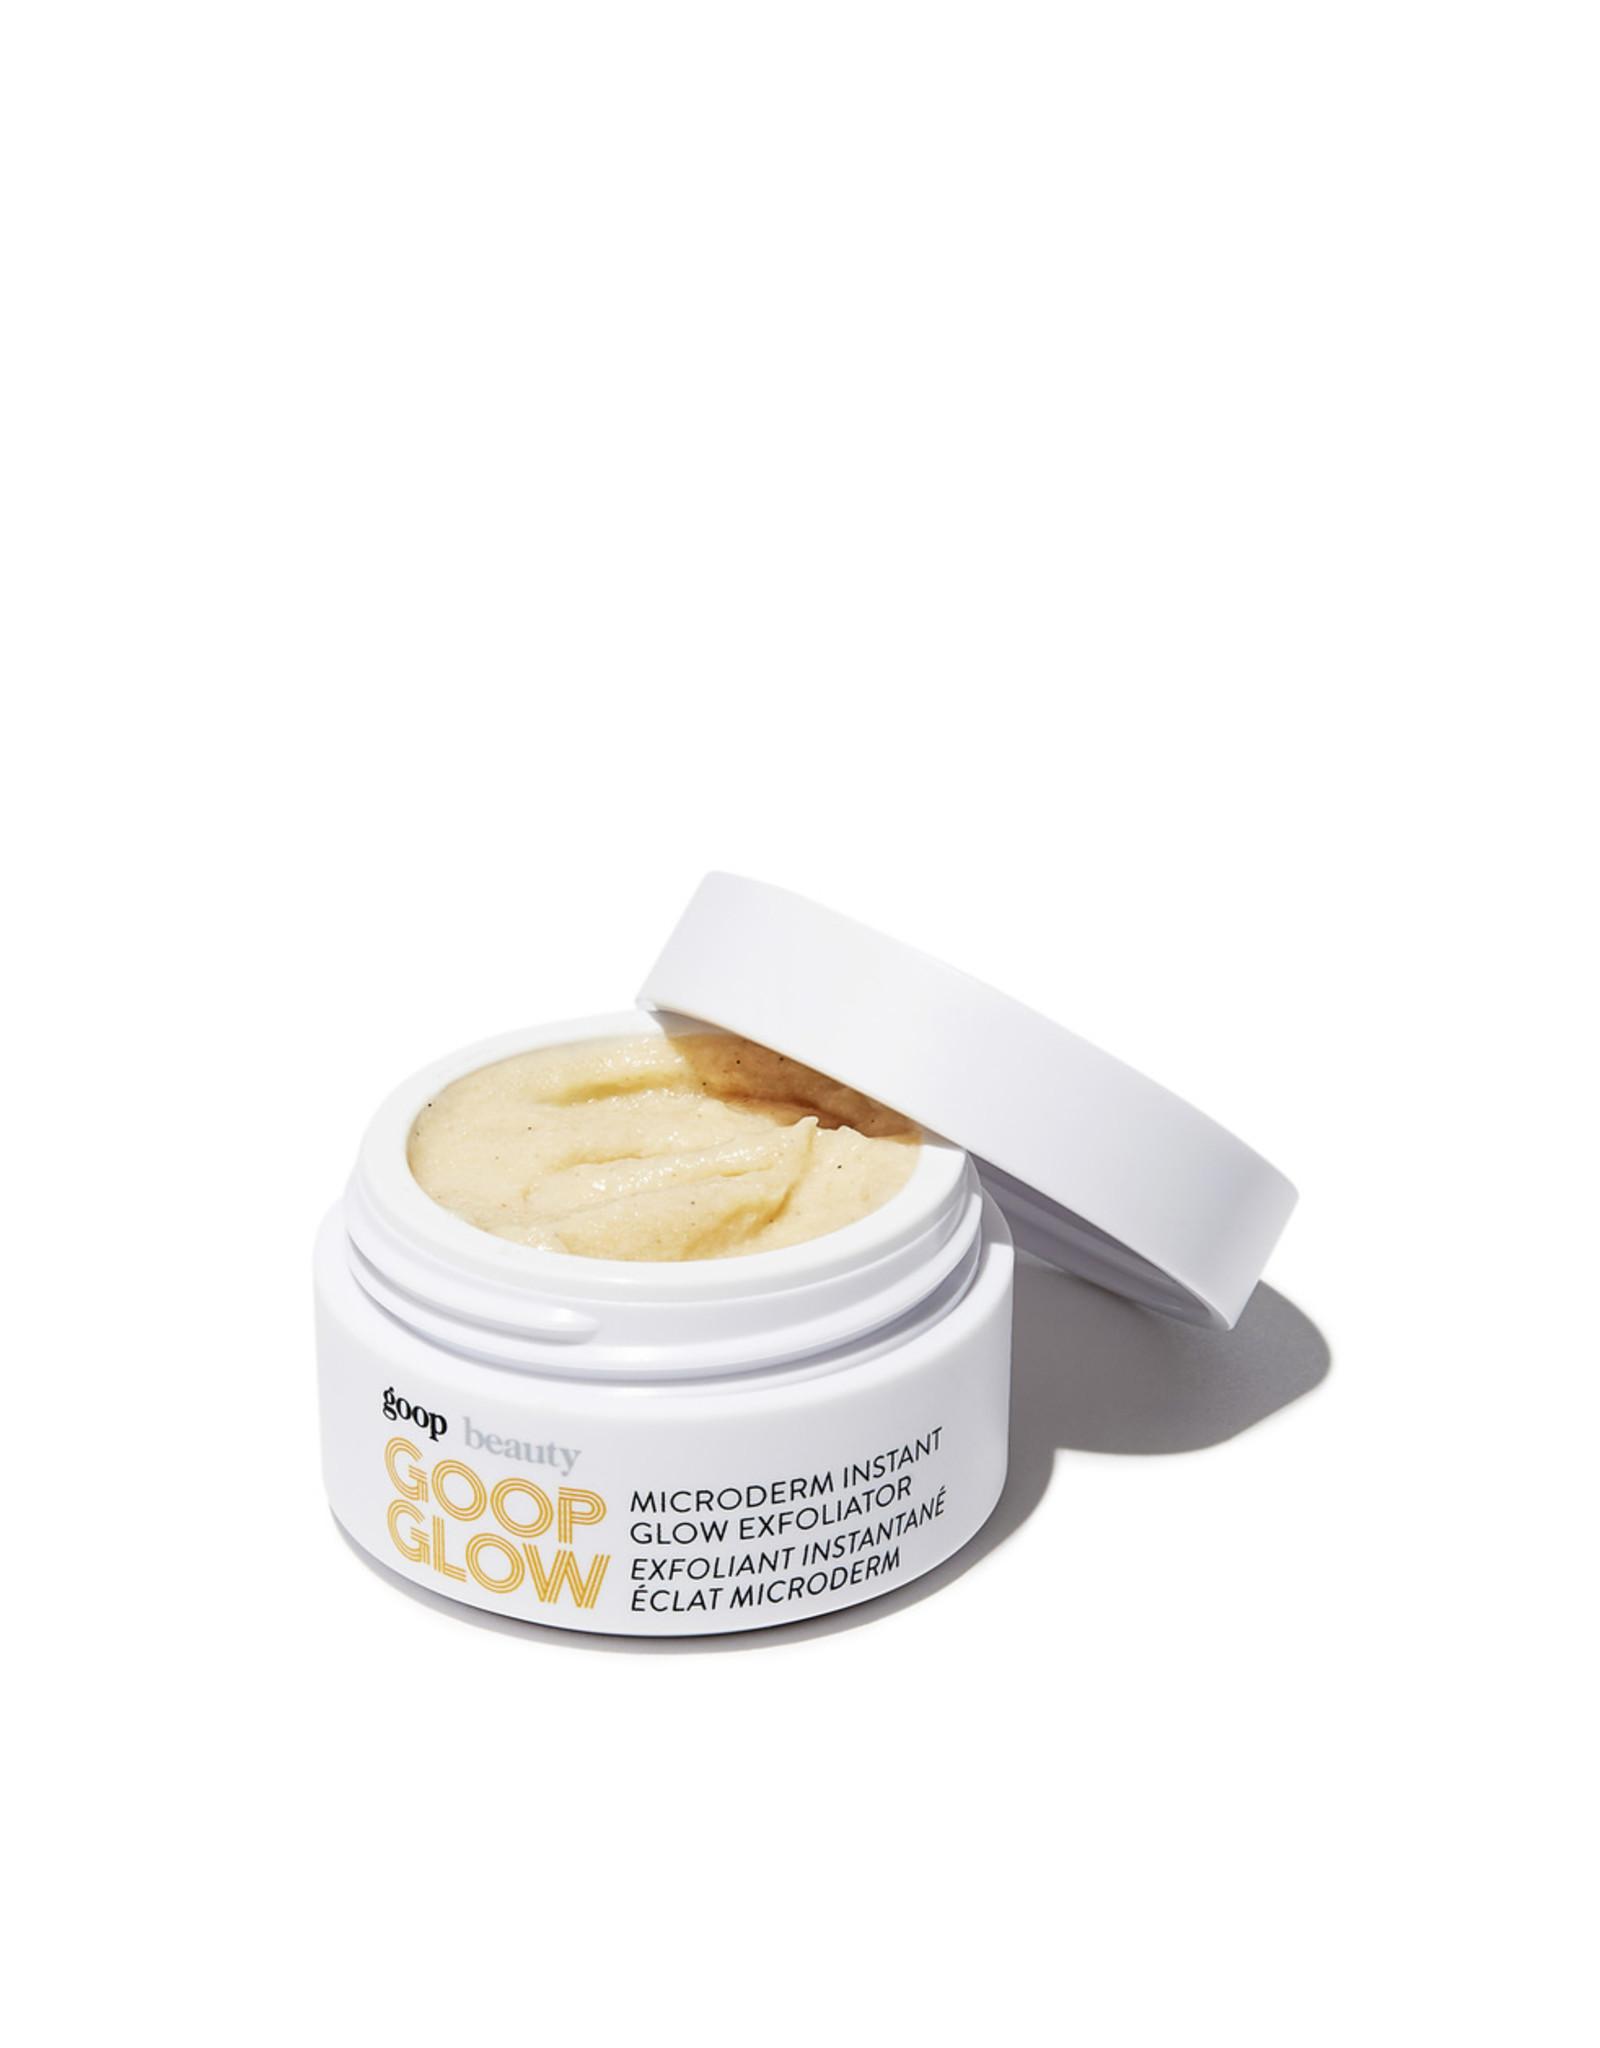 goop Skincare GOOPGLOW Microderm Instant Glow Exfoliator (Size: 15ml)